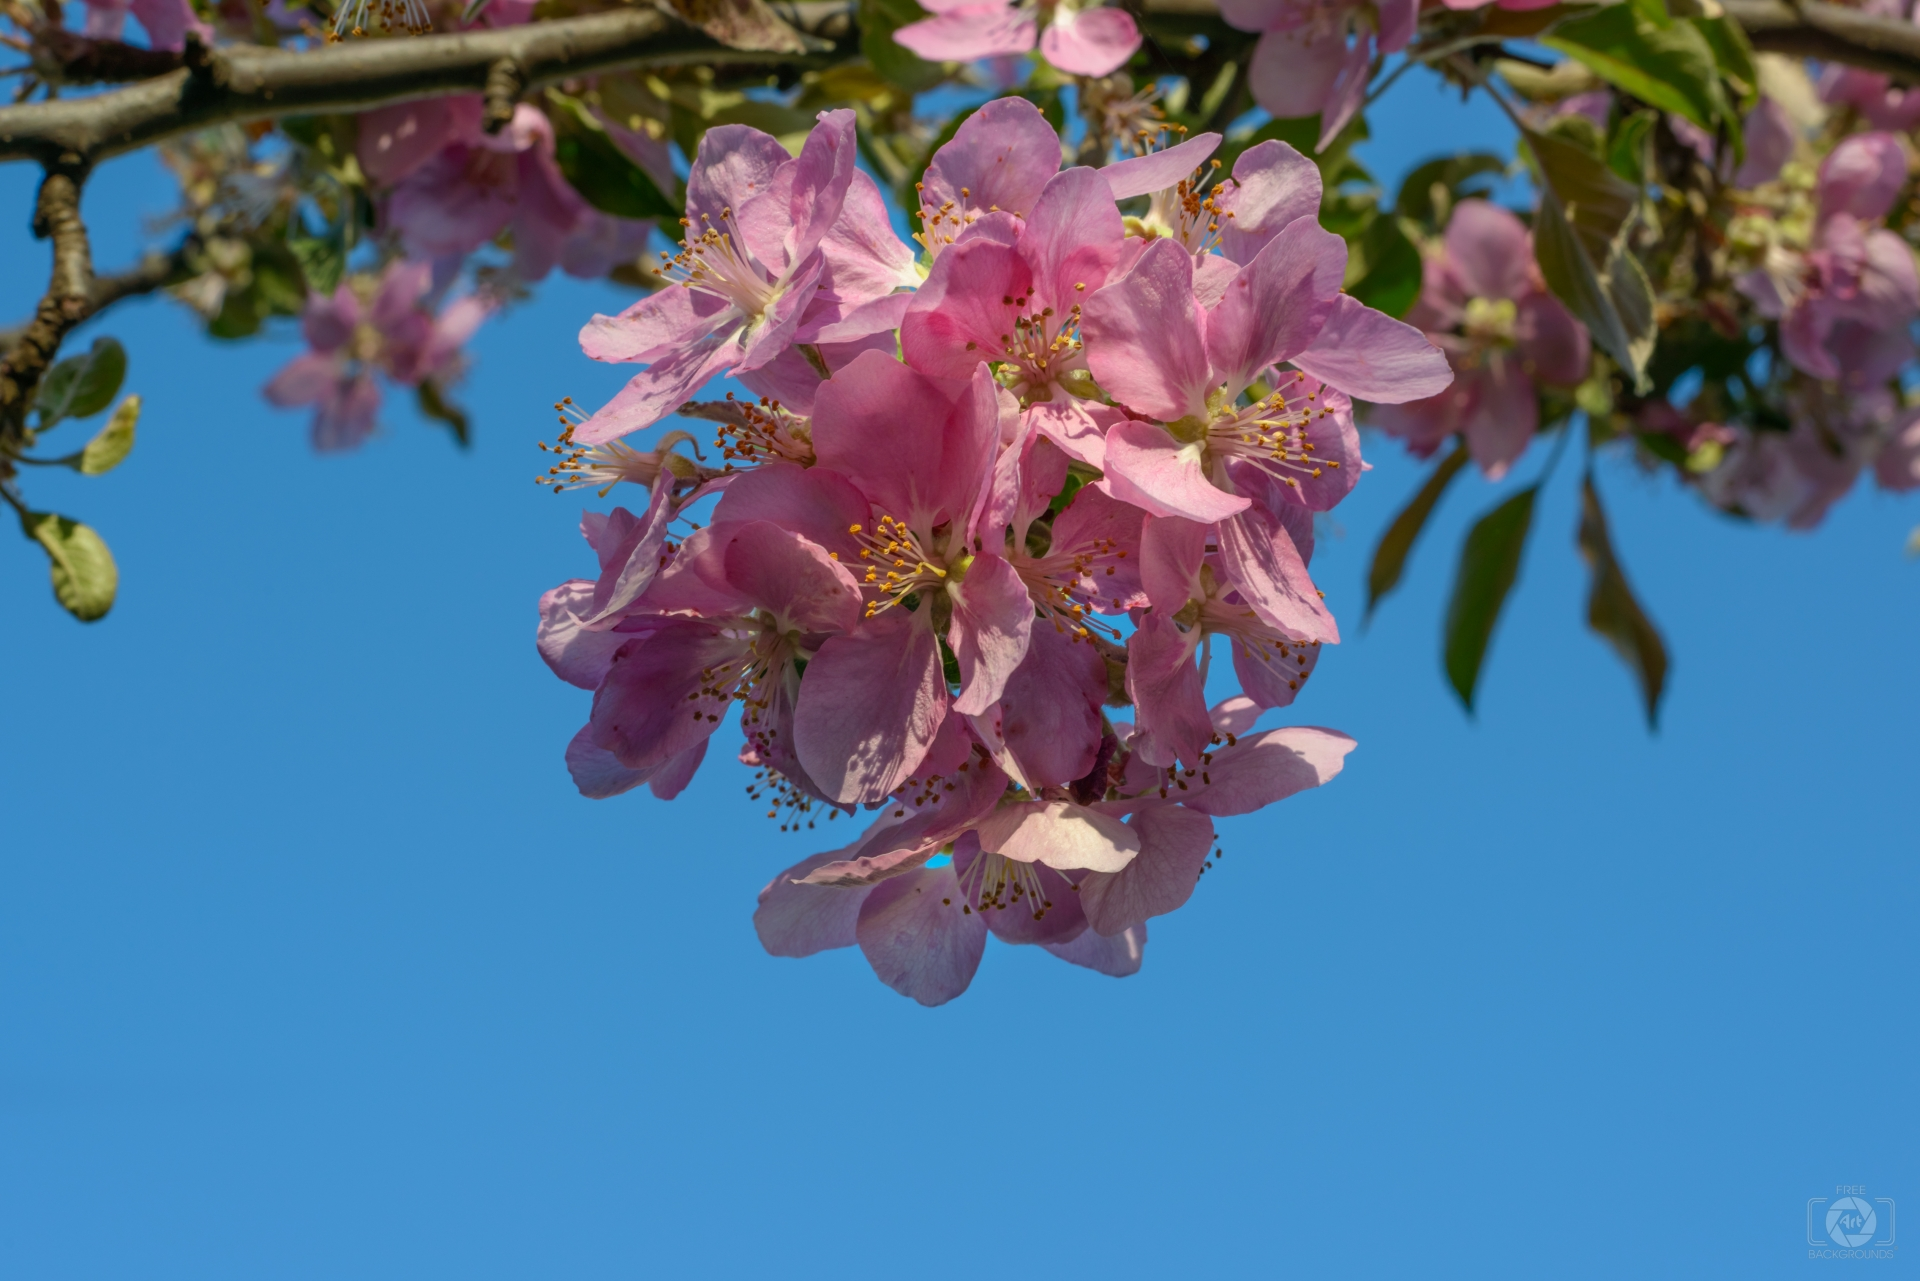 Free photo: Blooming - nature, yellow, garden - Creative Commons ...